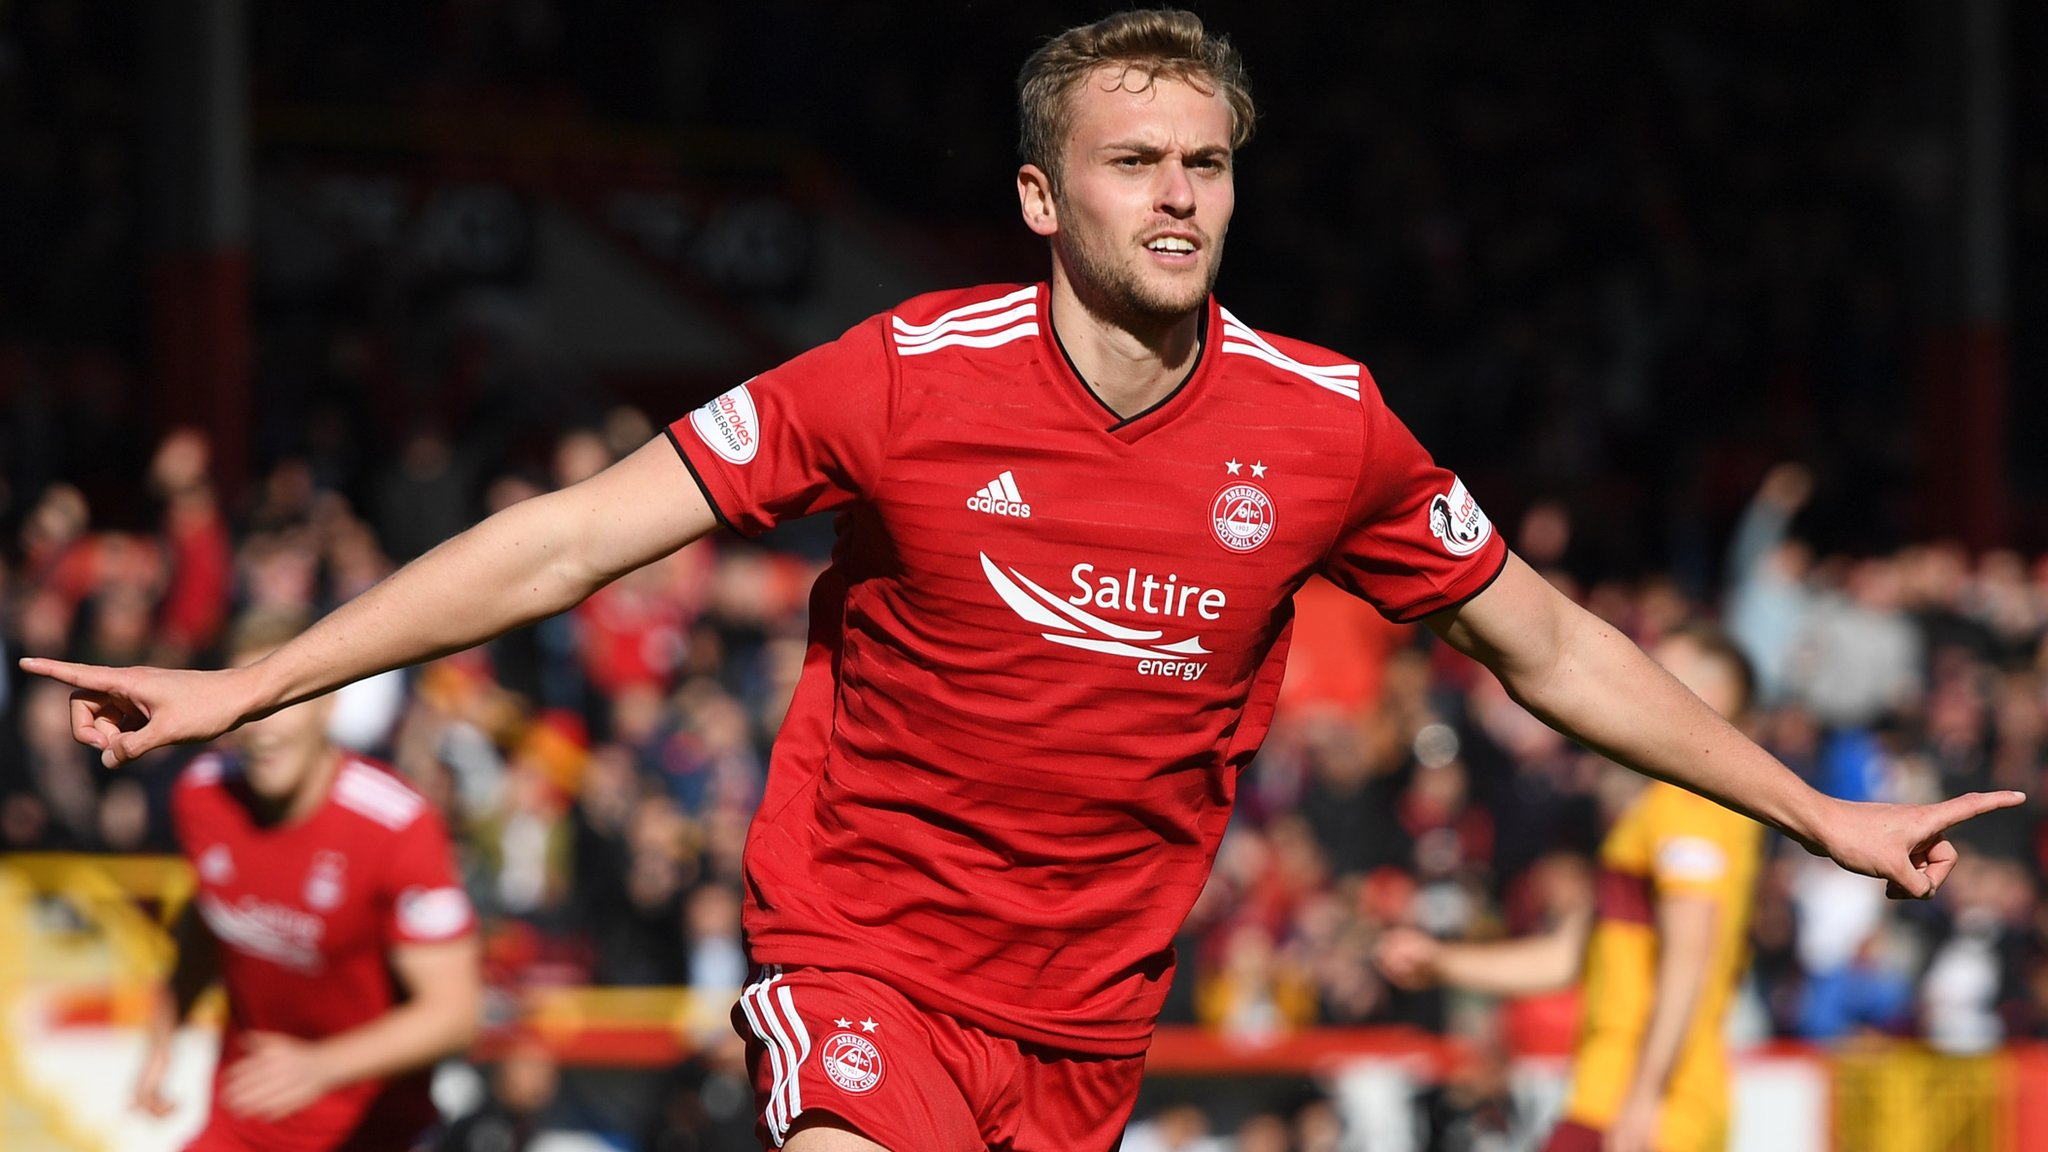 James Wilson goal gives Aberdeen 1-0 win over Motherwell